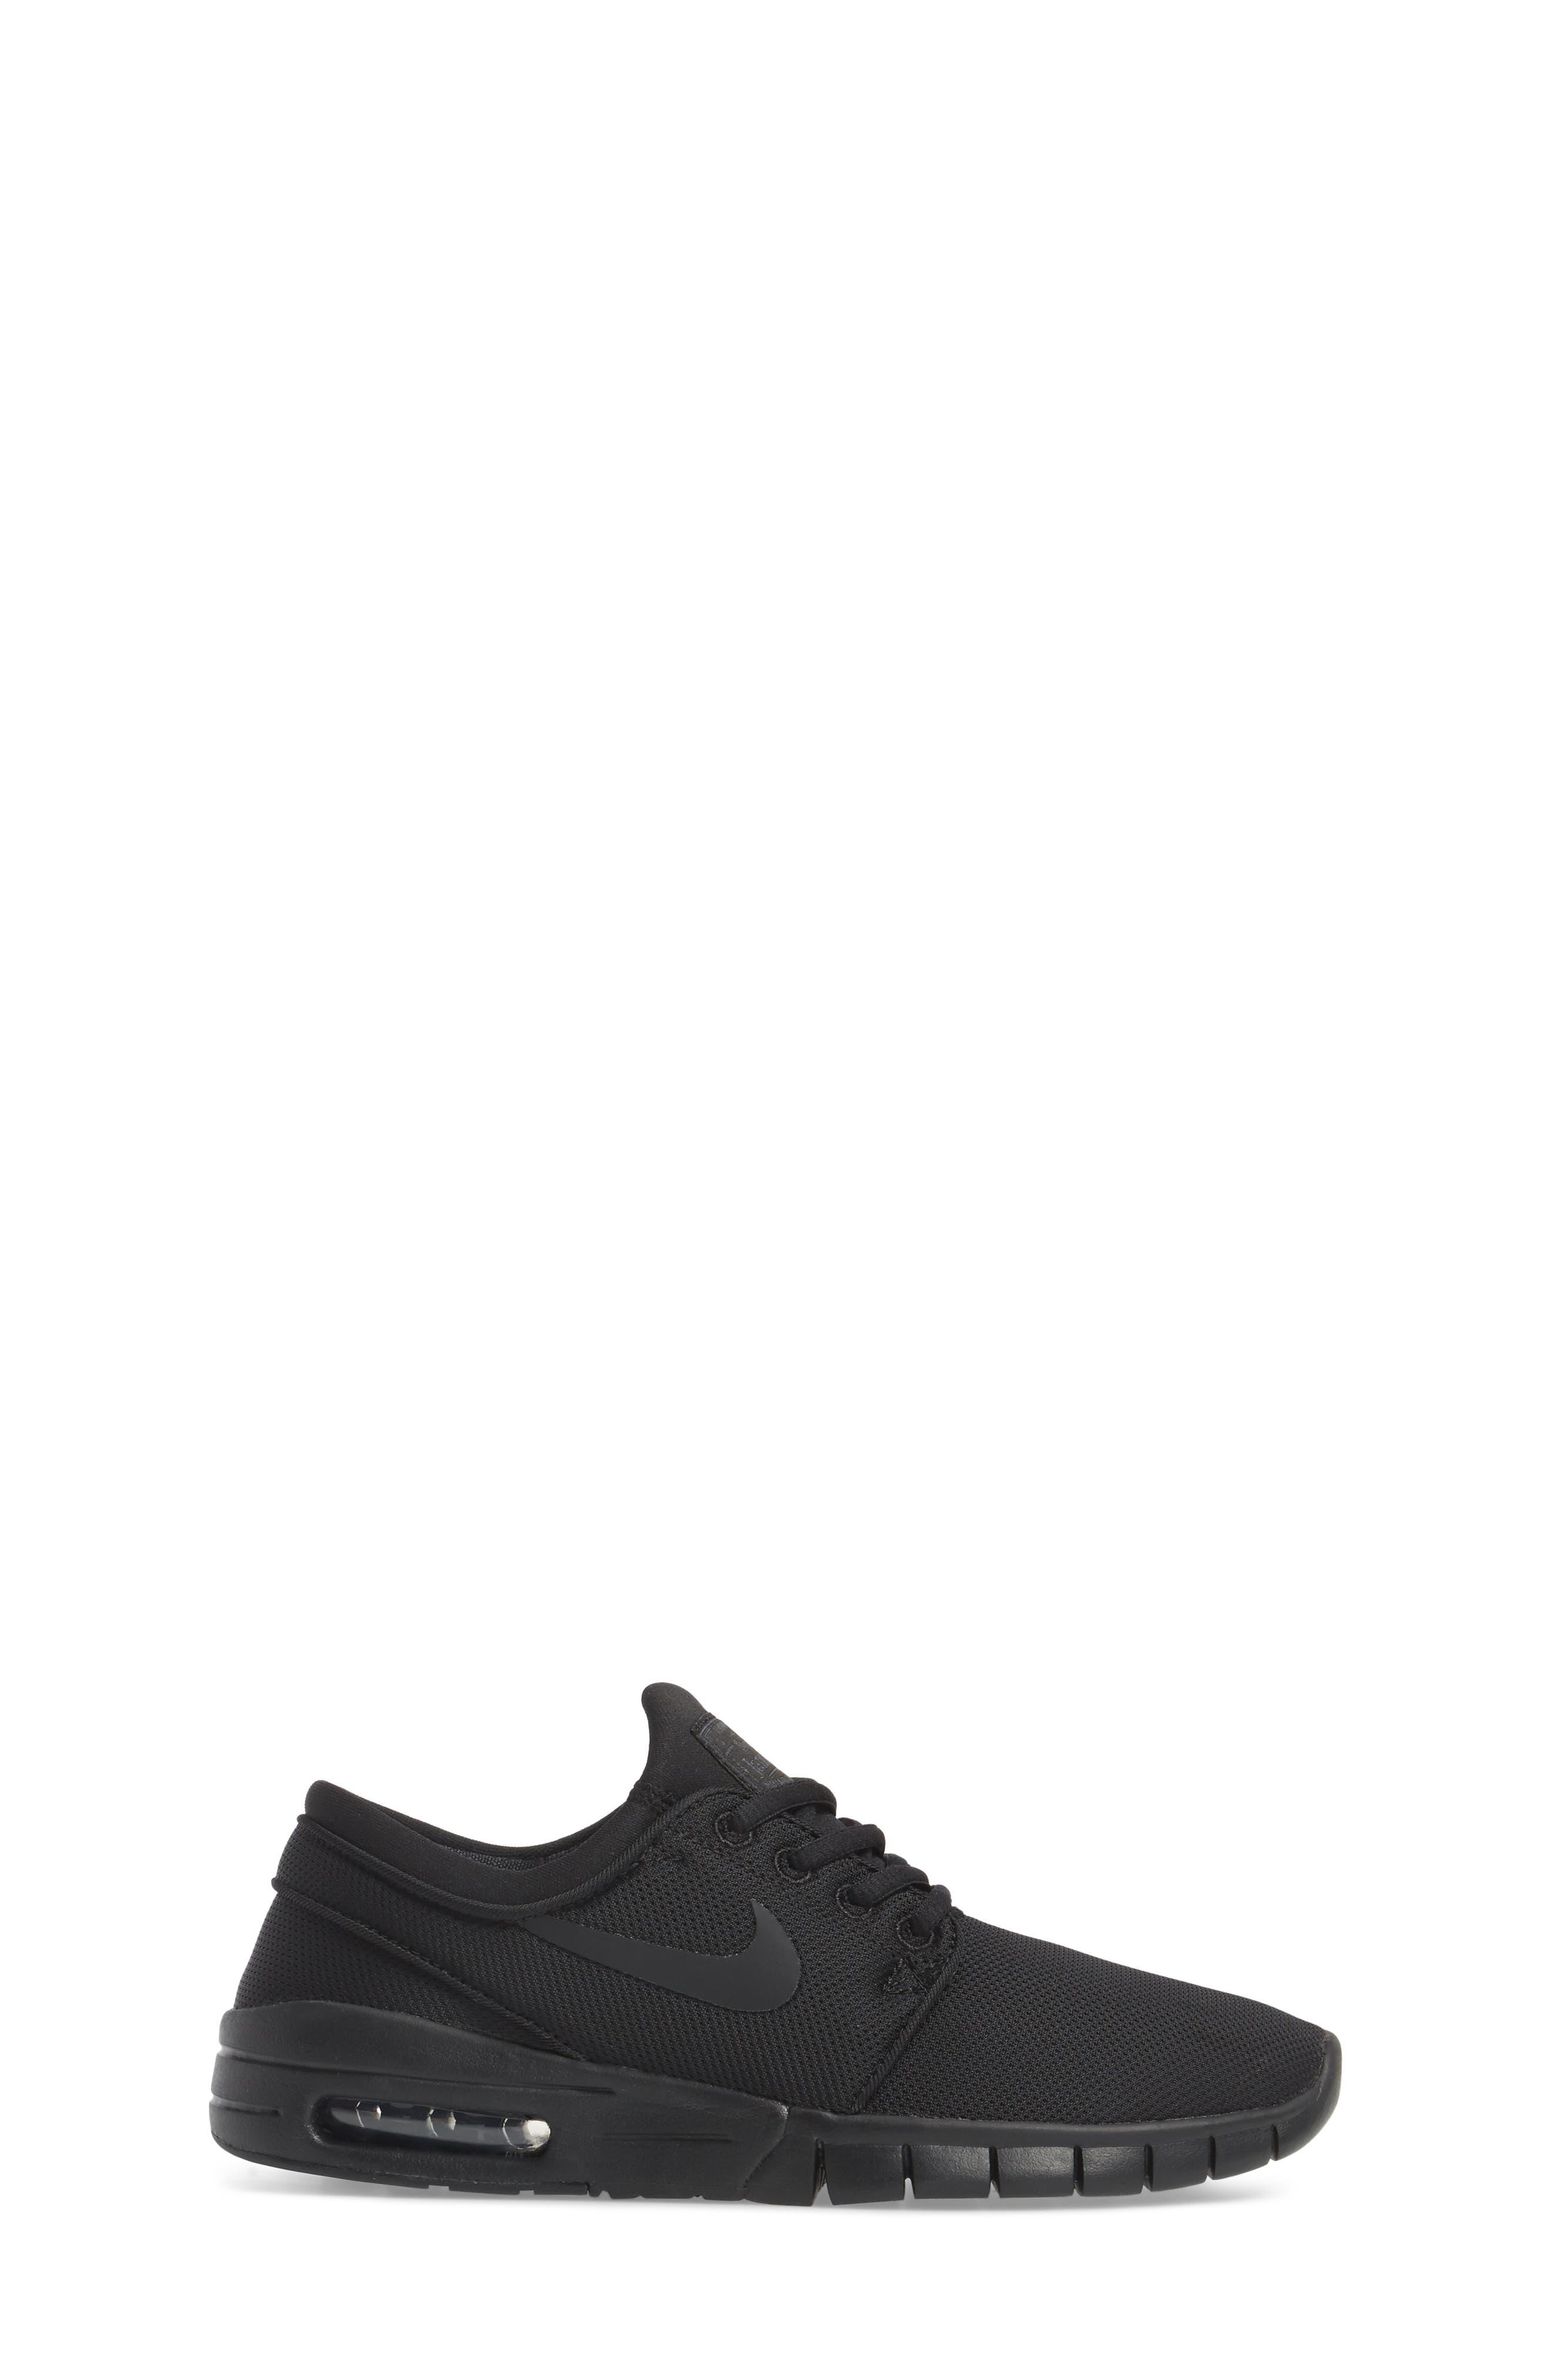 Stefan Janoski Max SB Skate Sneaker,                             Alternate thumbnail 24, color,